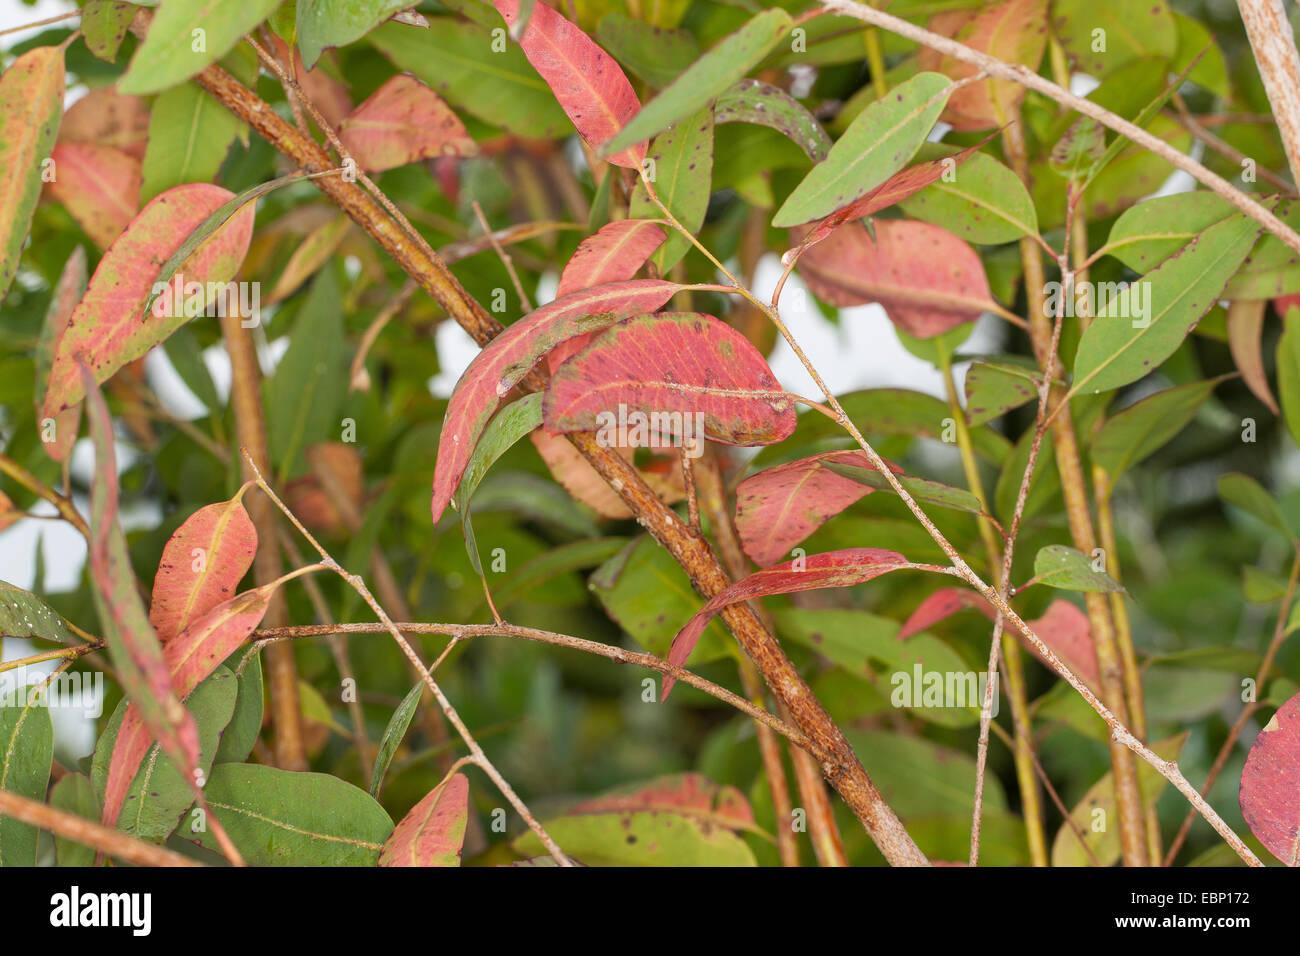 Eucalipto redgum Longbeak, Río, río red gum (Eucalyptus camaldulensis), rama Imagen De Stock